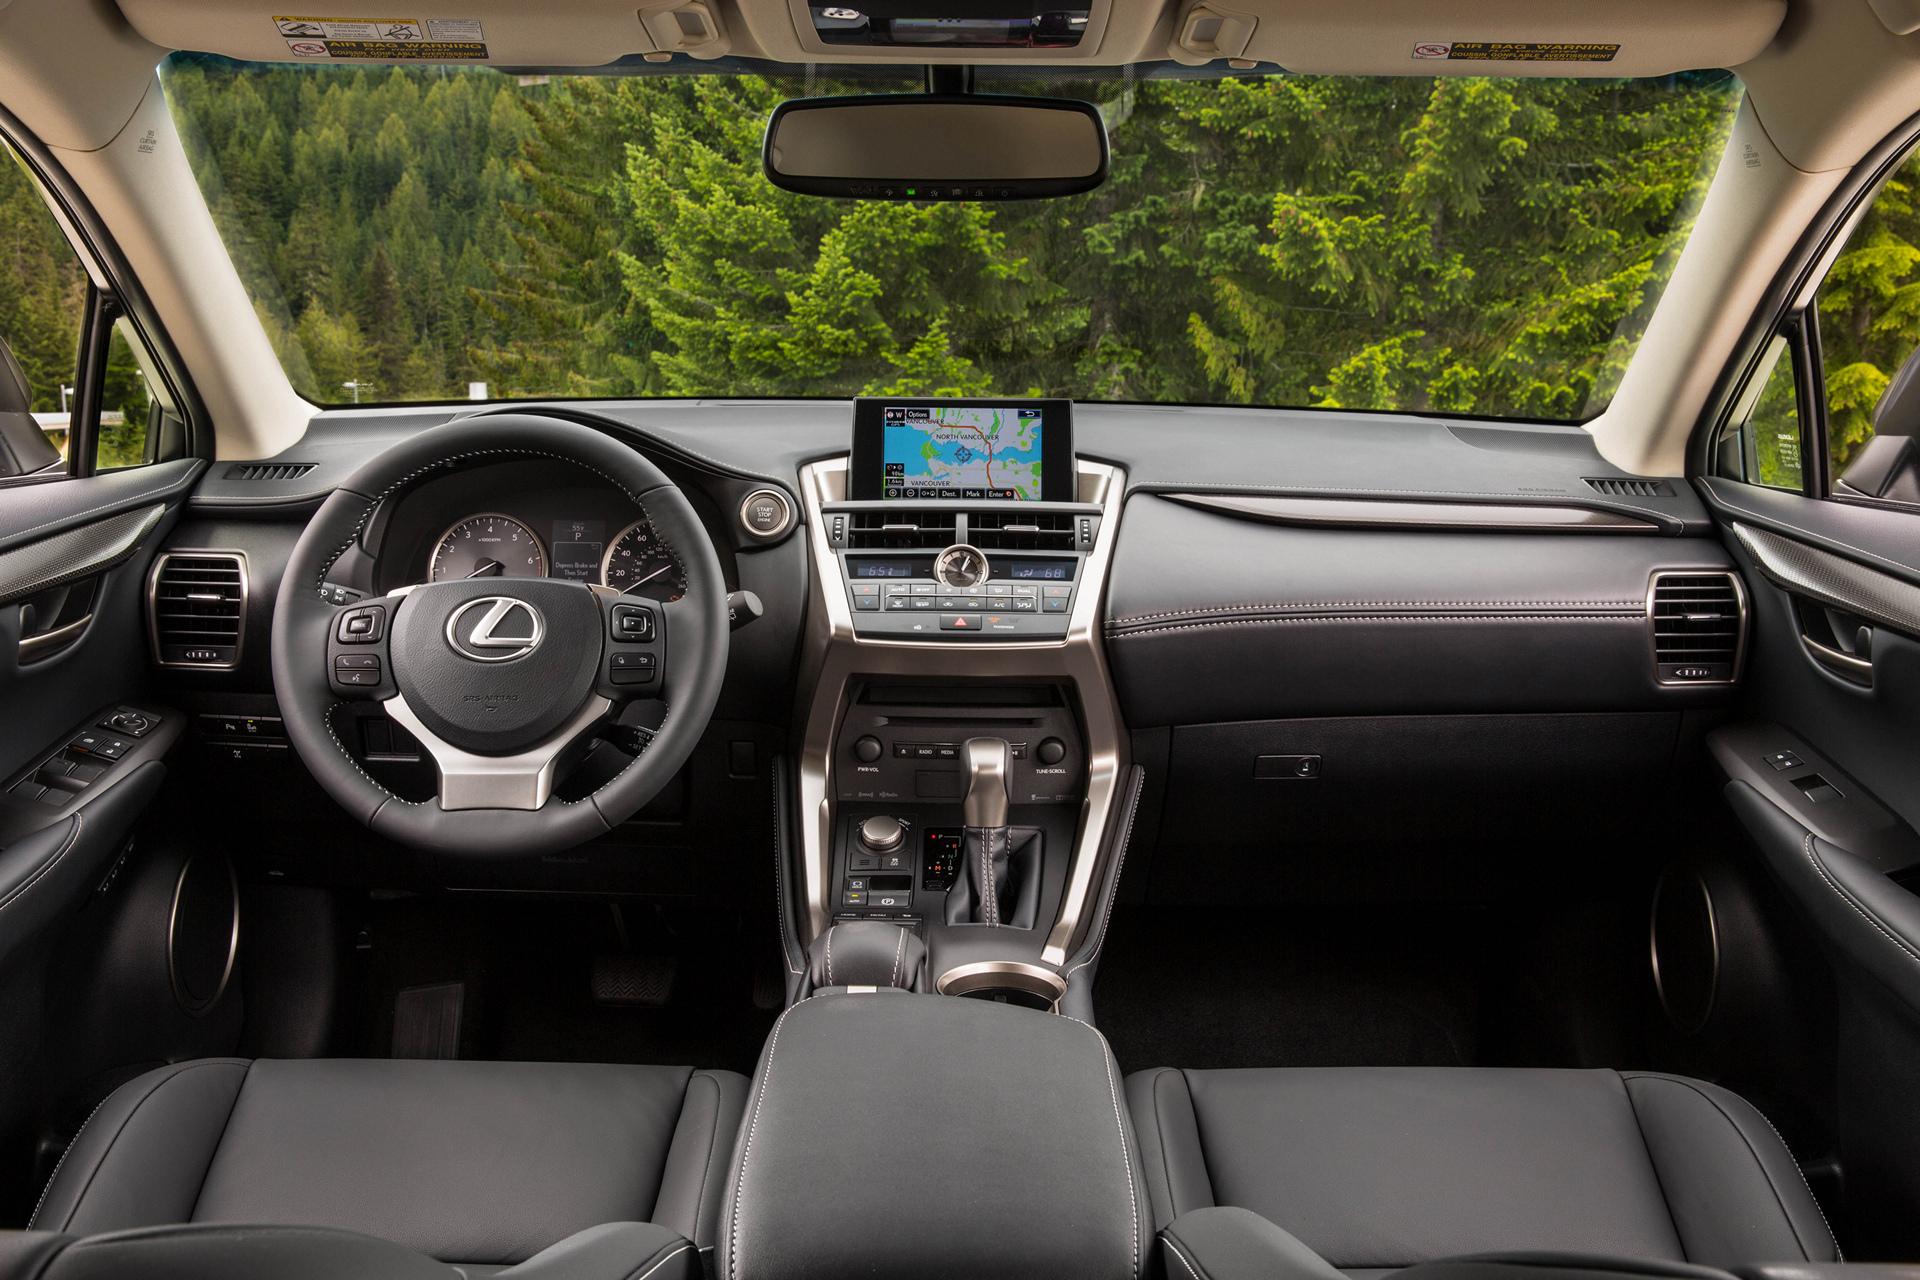 2016 Lexus NX 200t © Toyota Motor Corporation